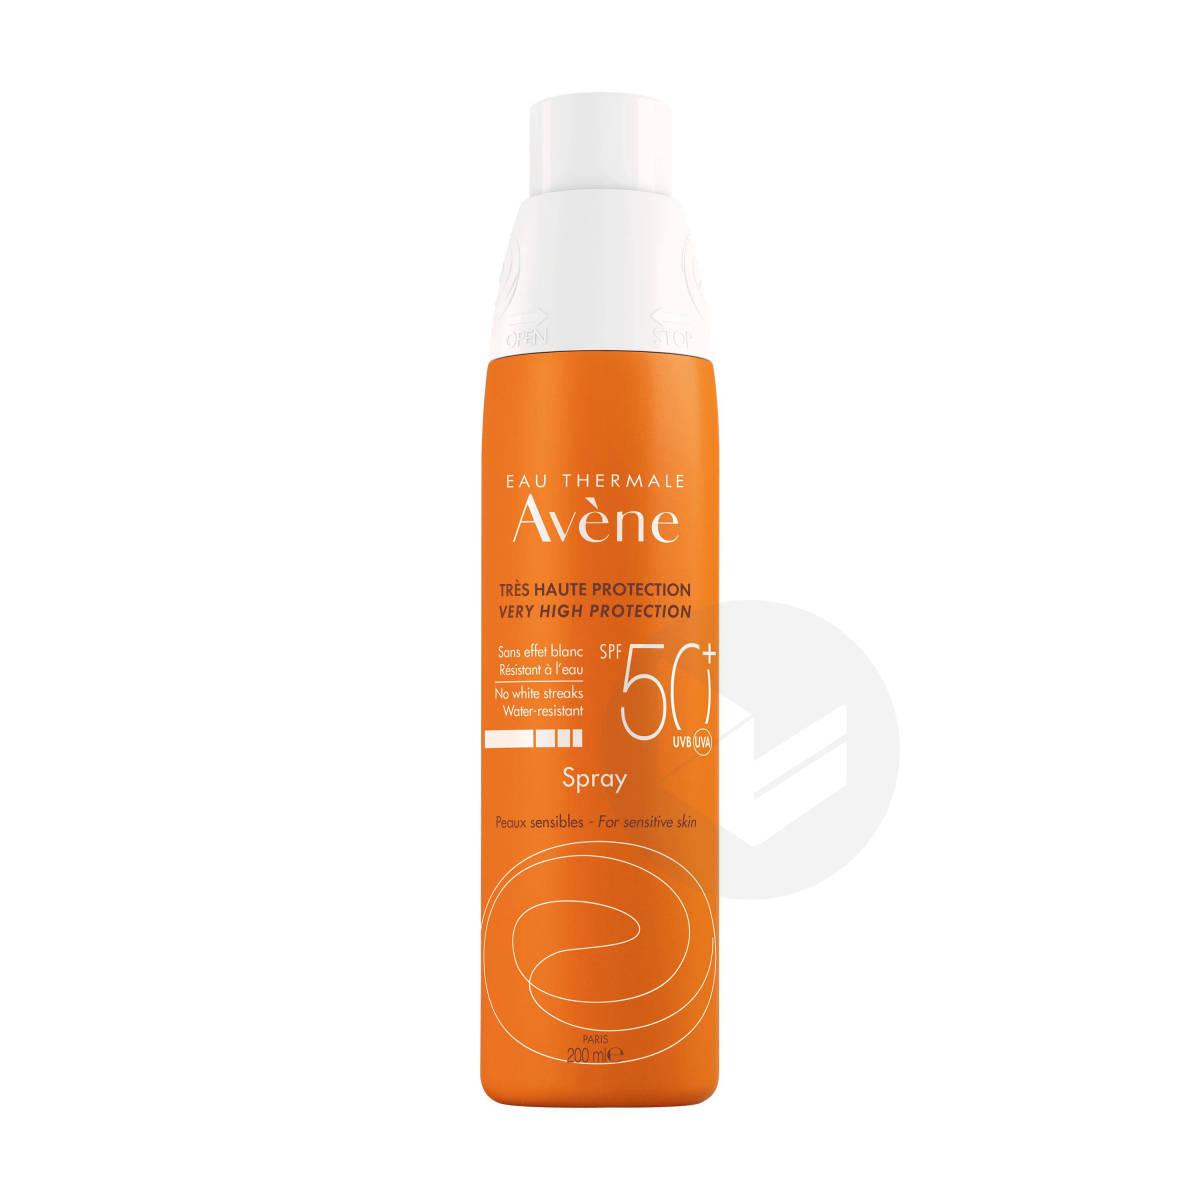 Avene Solaire Spray 50